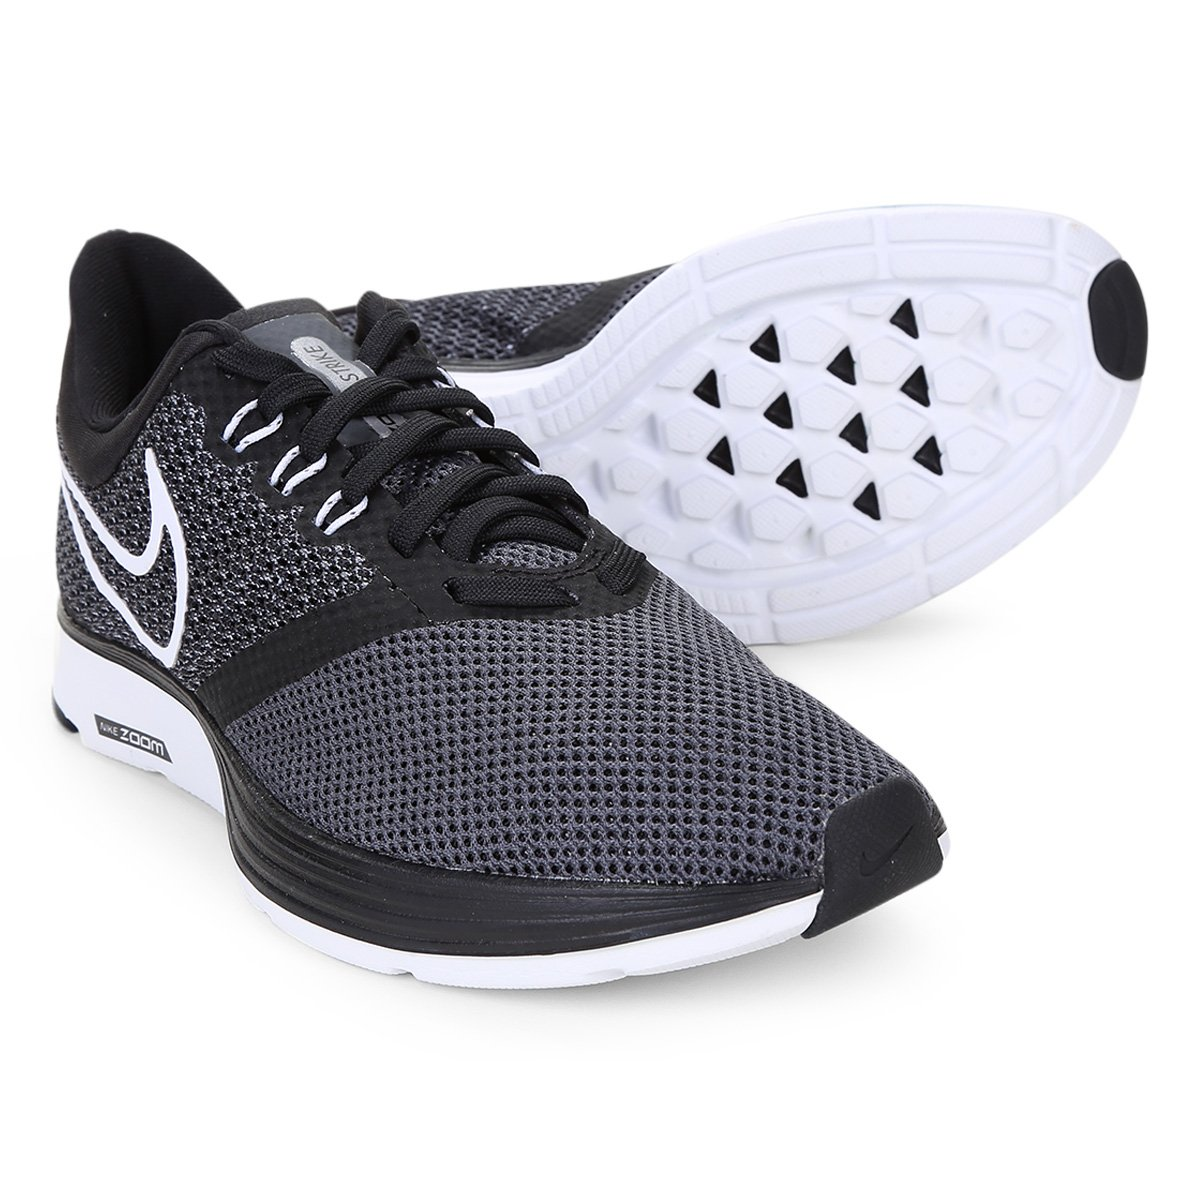 78acf7762 Tênis Nike Zoom Strike Feminino - Compre Agora